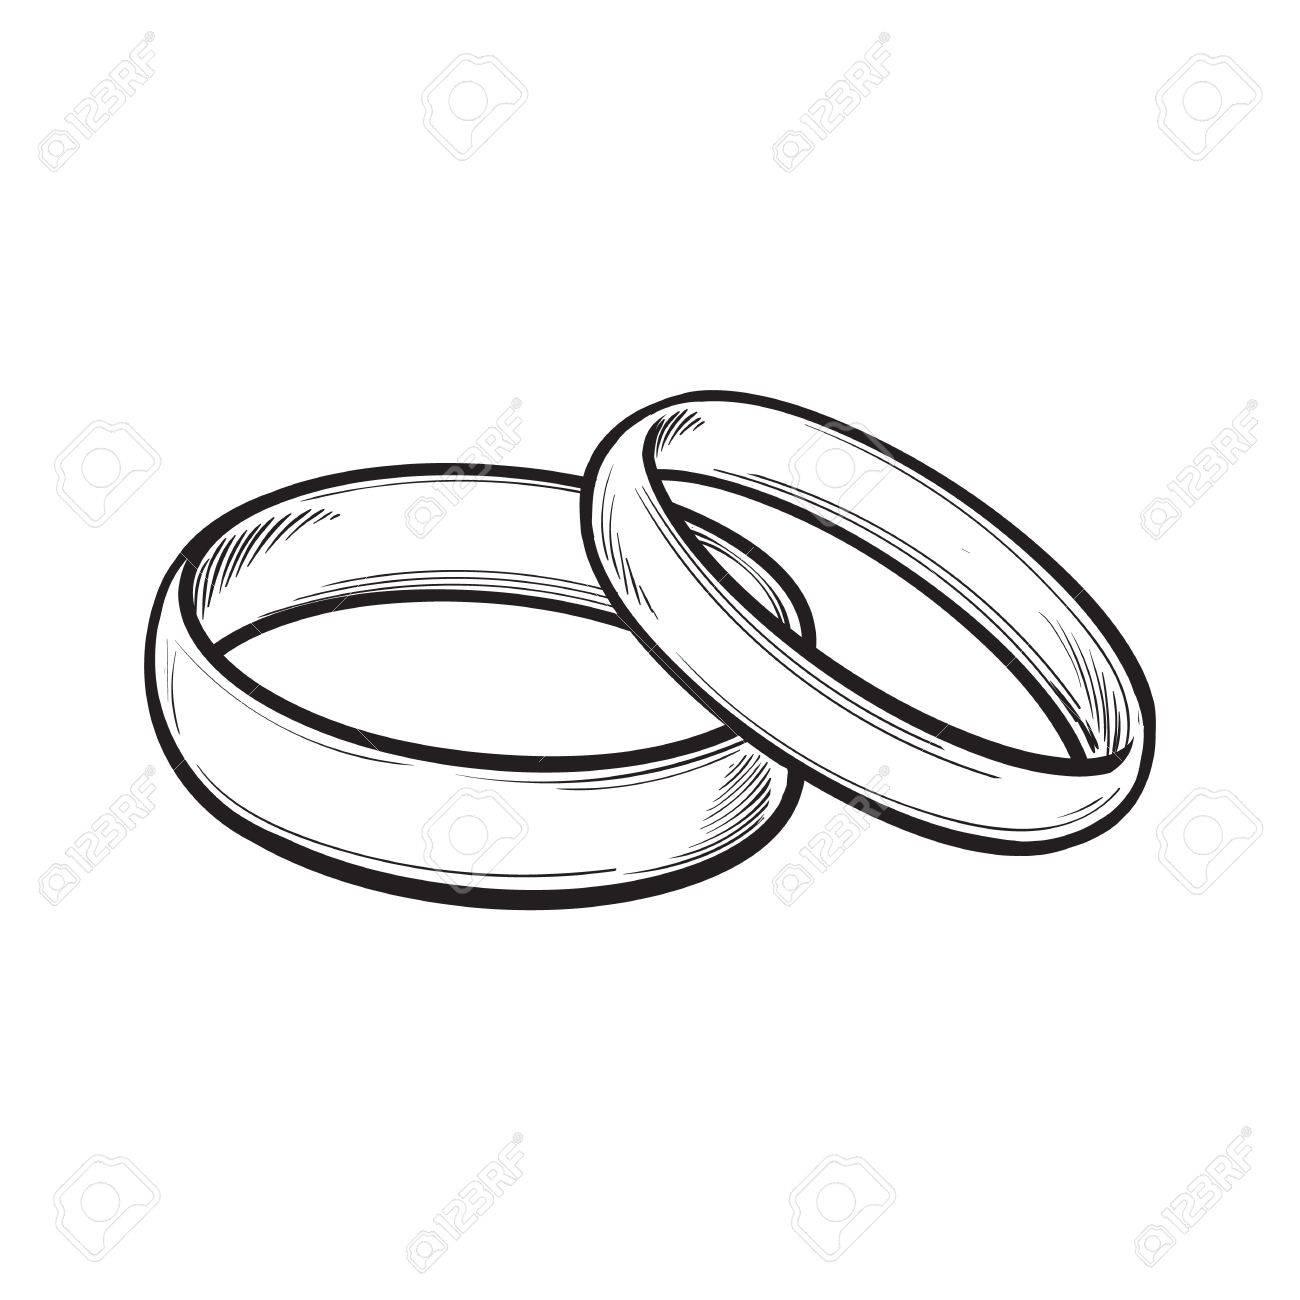 Paar Traditionelle Goldene Hochzeit Ringe Skizze Stil Illustration